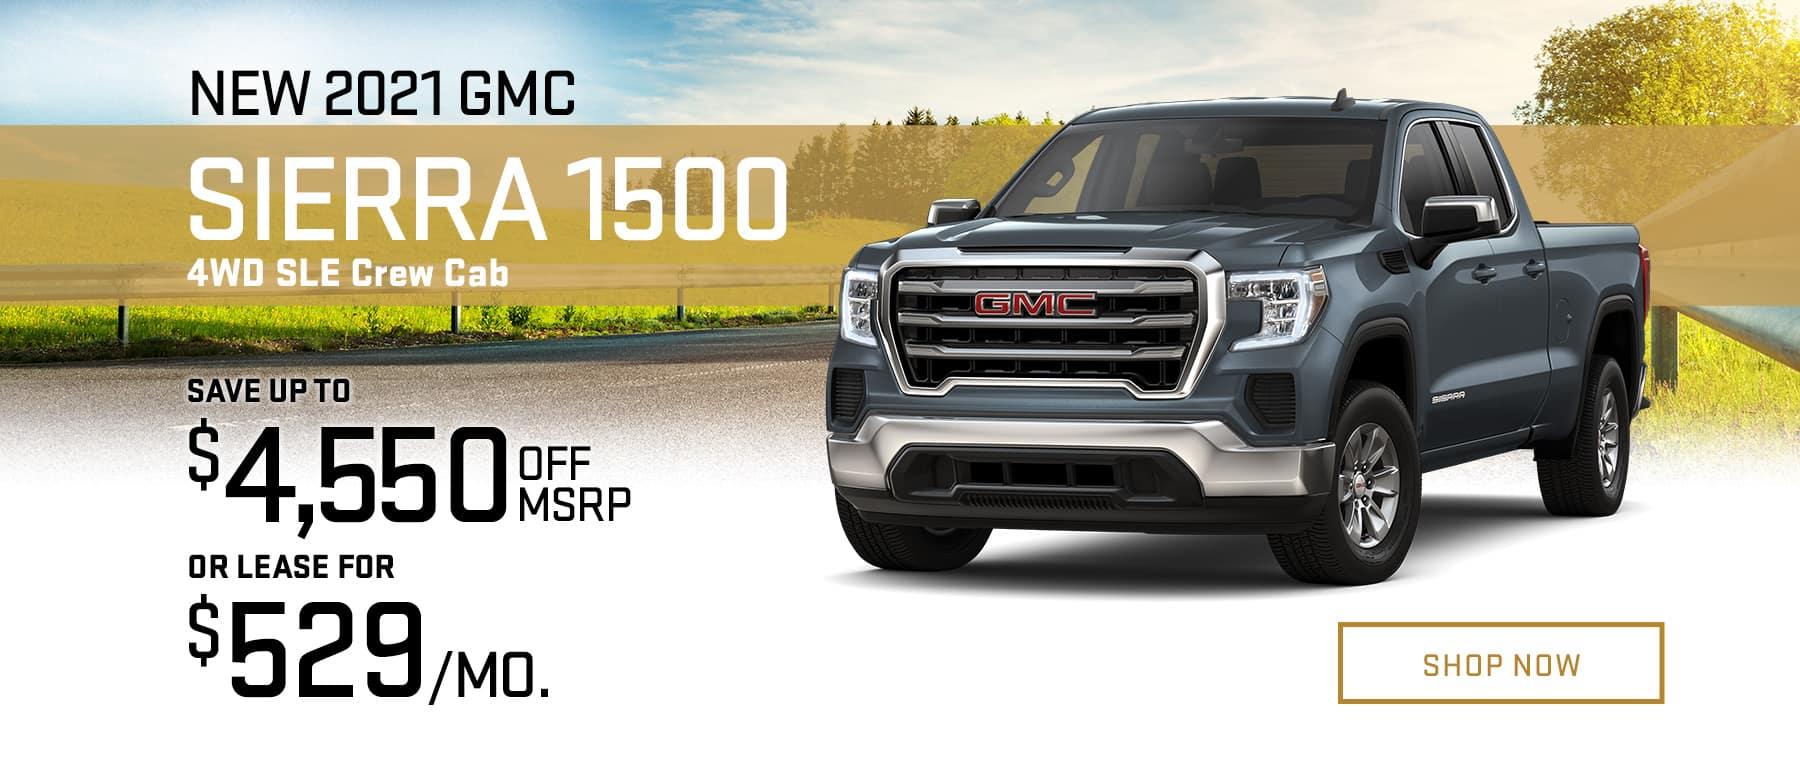 BCO-1800×760-New 2021 GMC Sierra 1500 4WD SLE Crew Cab _0621